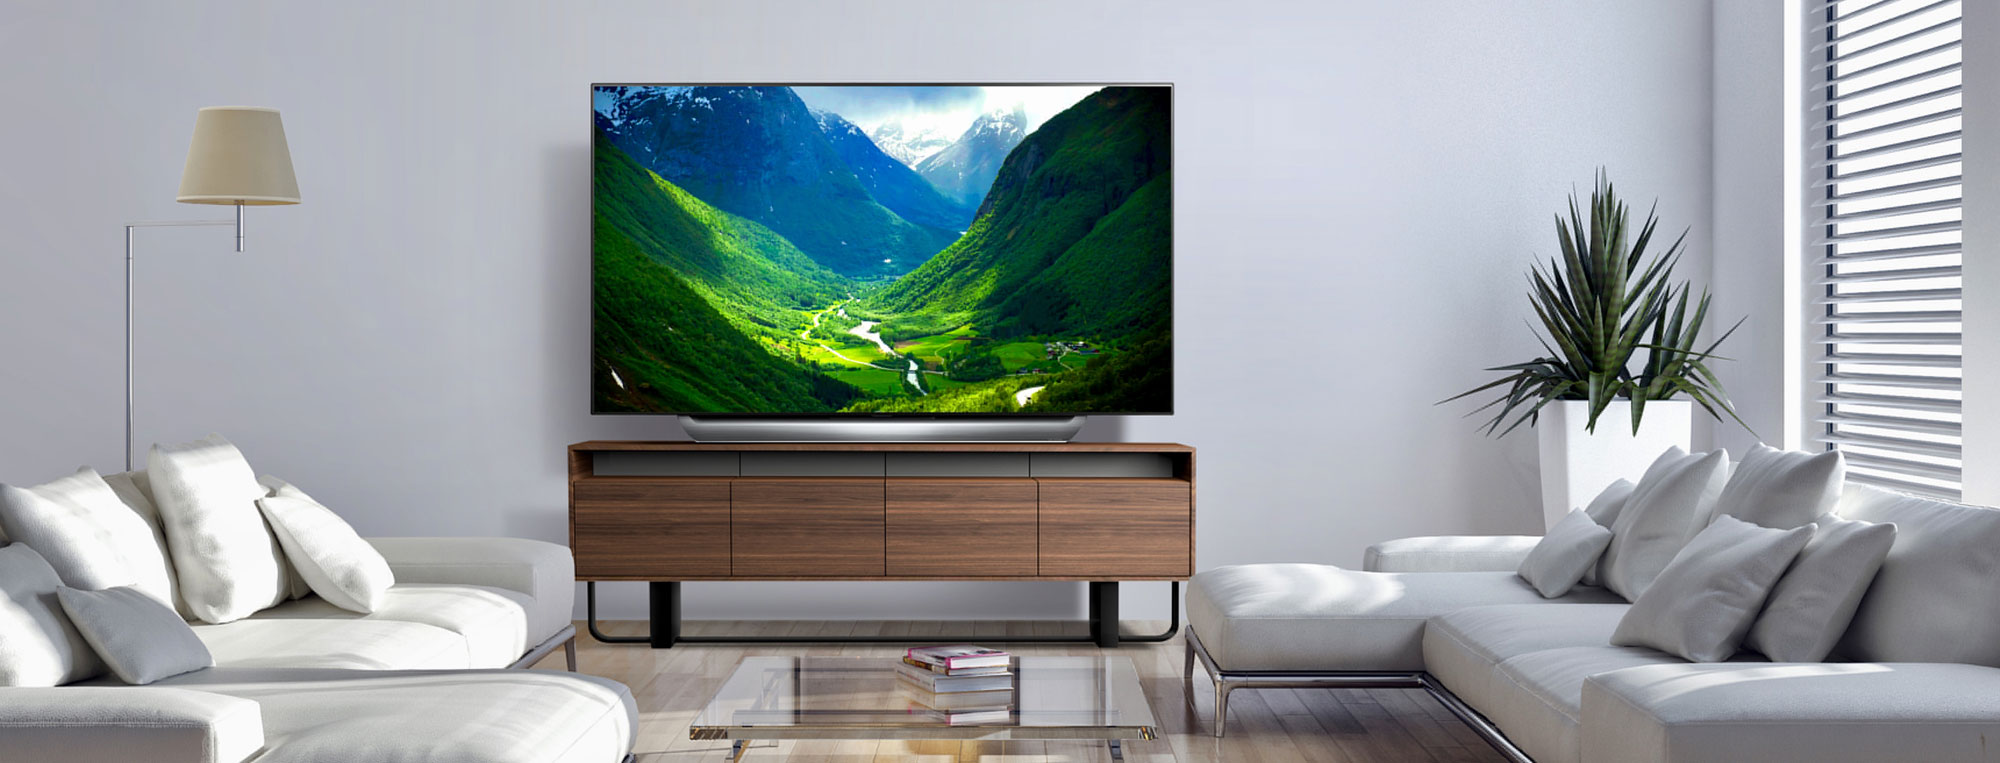 televisori roma